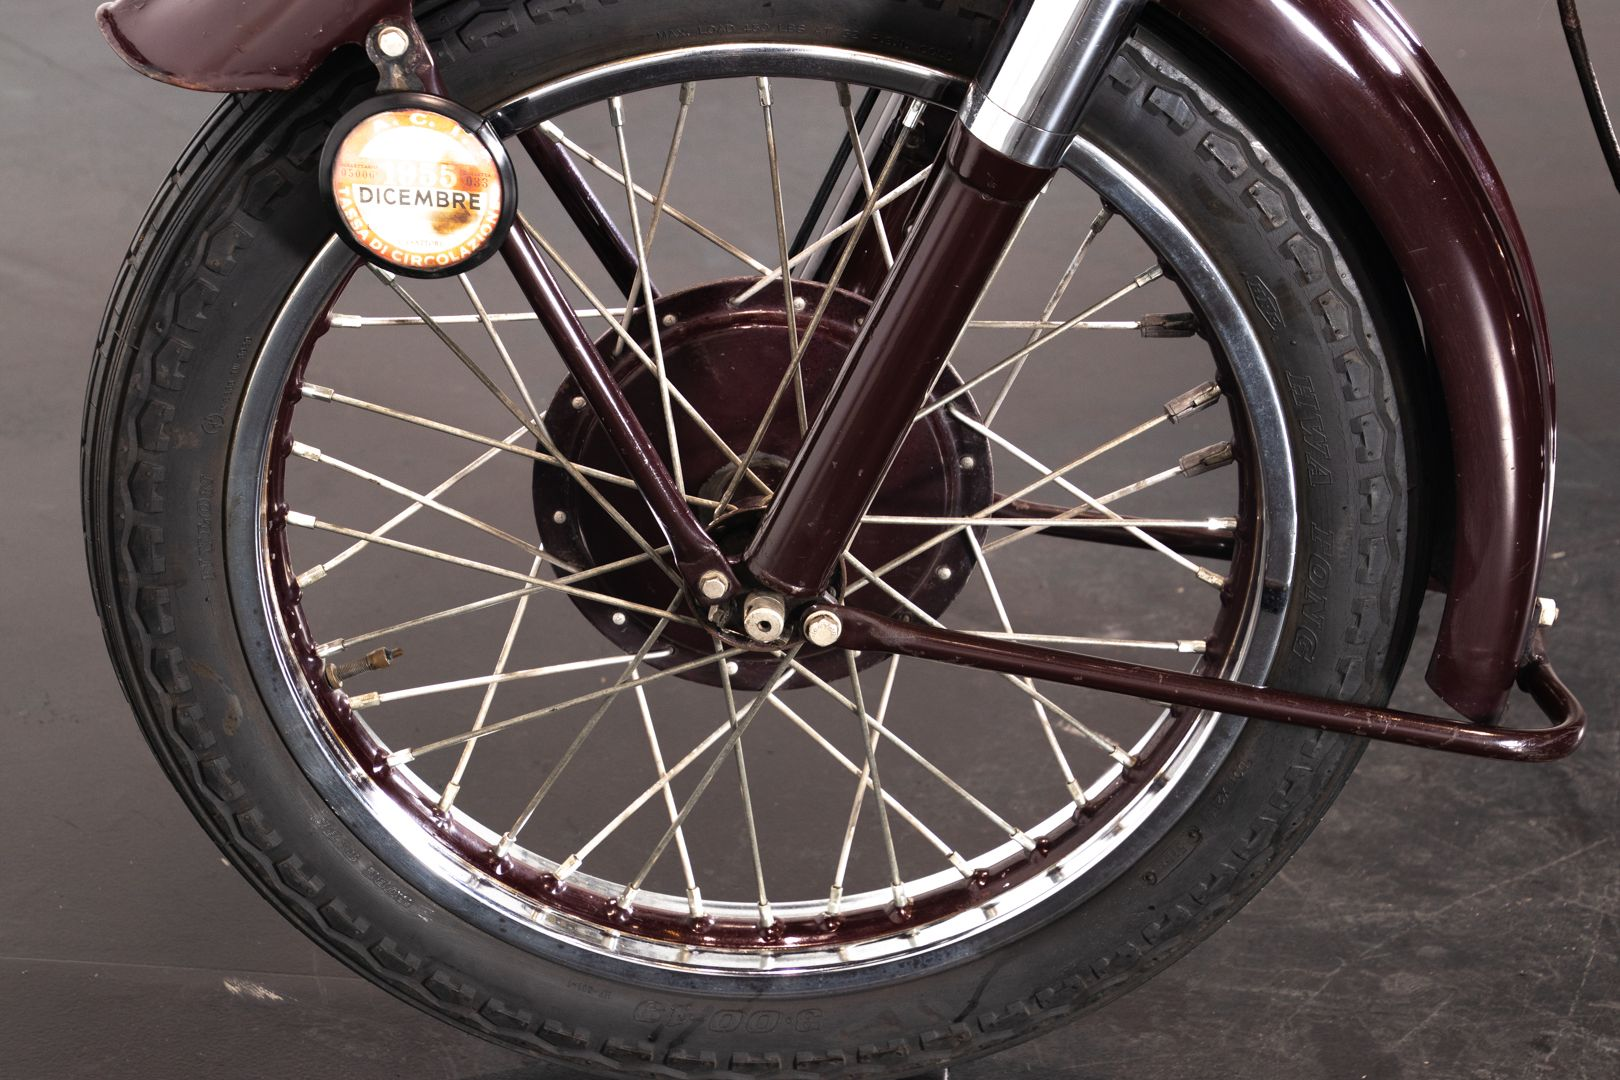 1955 Ariel 350 29833